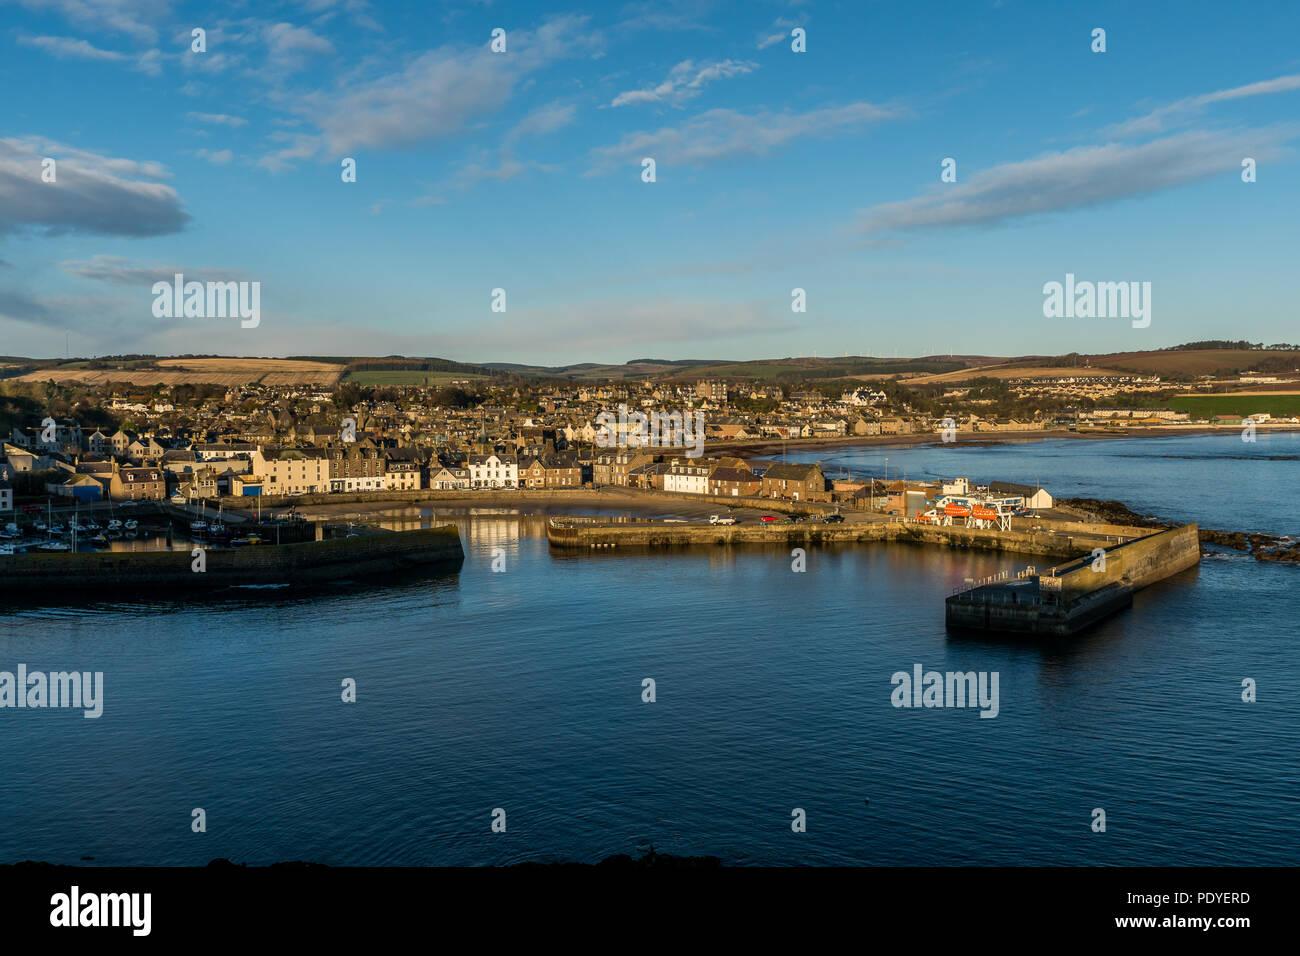 Stonehaven, Aberdeenshire, Scotland, UK, November 24th 2017. Stonehaven harbour on the east coast of Scotland. - Stock Image